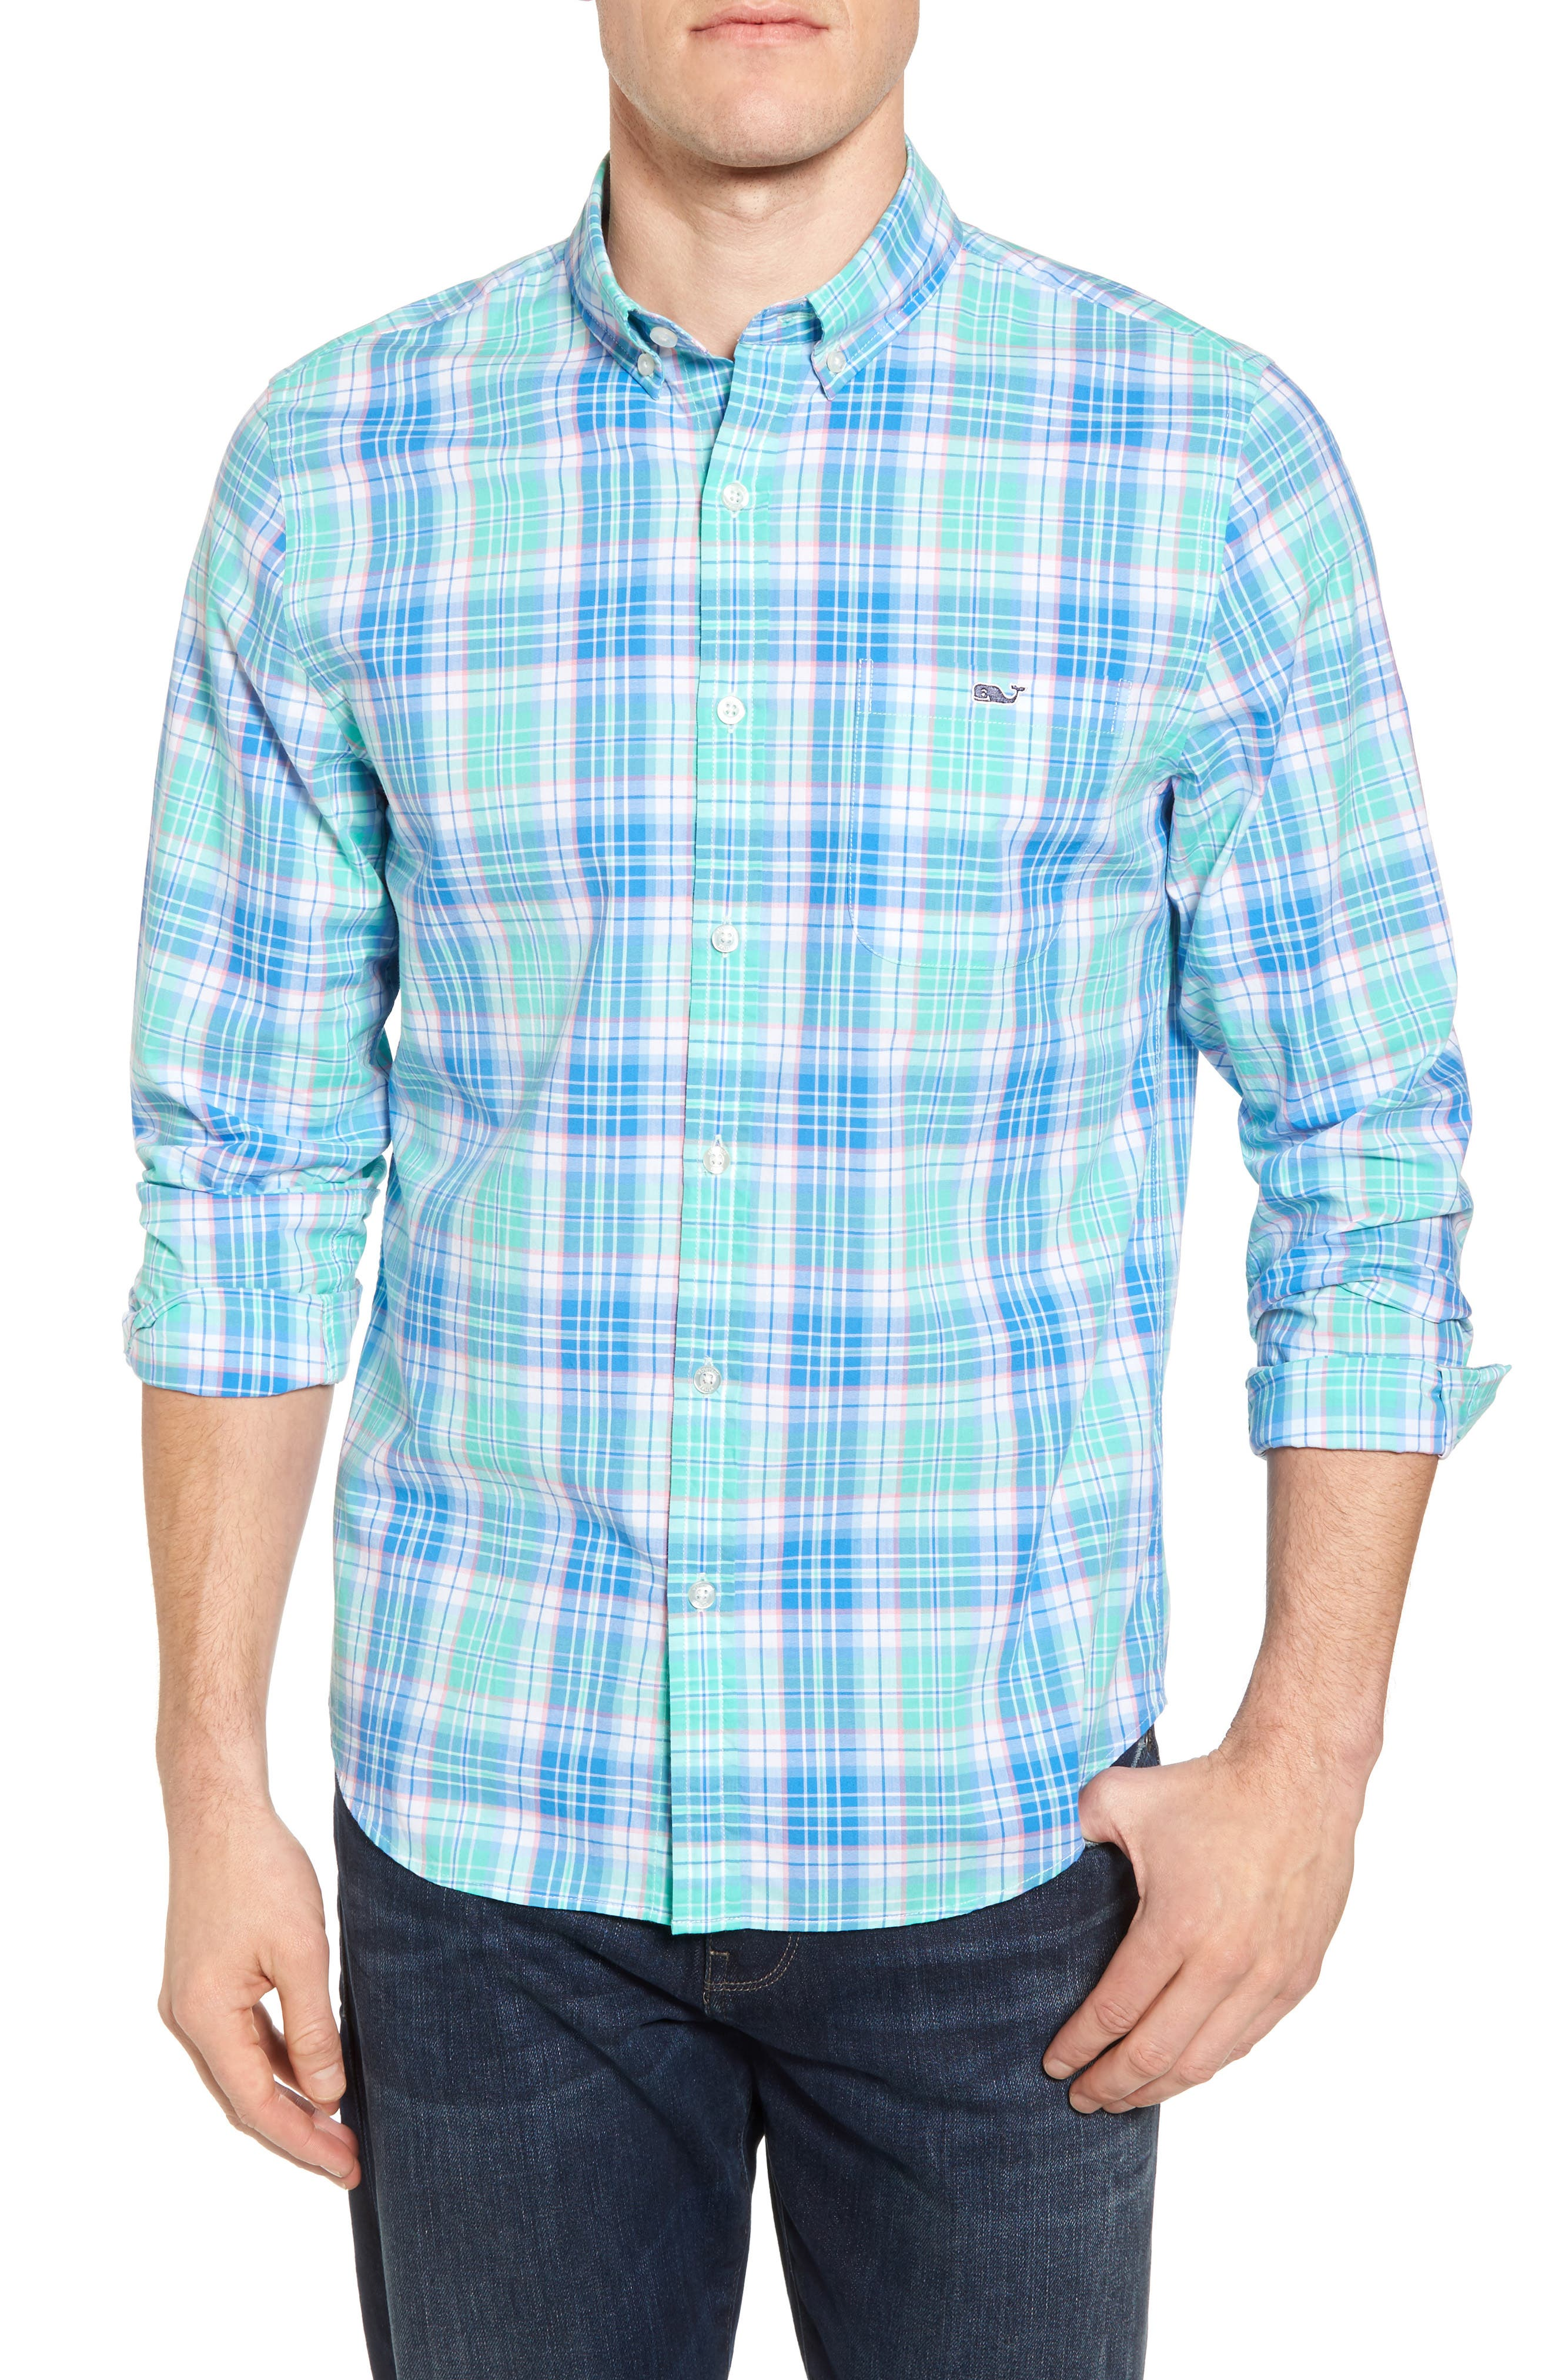 Sutherland Road Slim Fit Plaid Sport Shirt,                         Main,                         color, 359